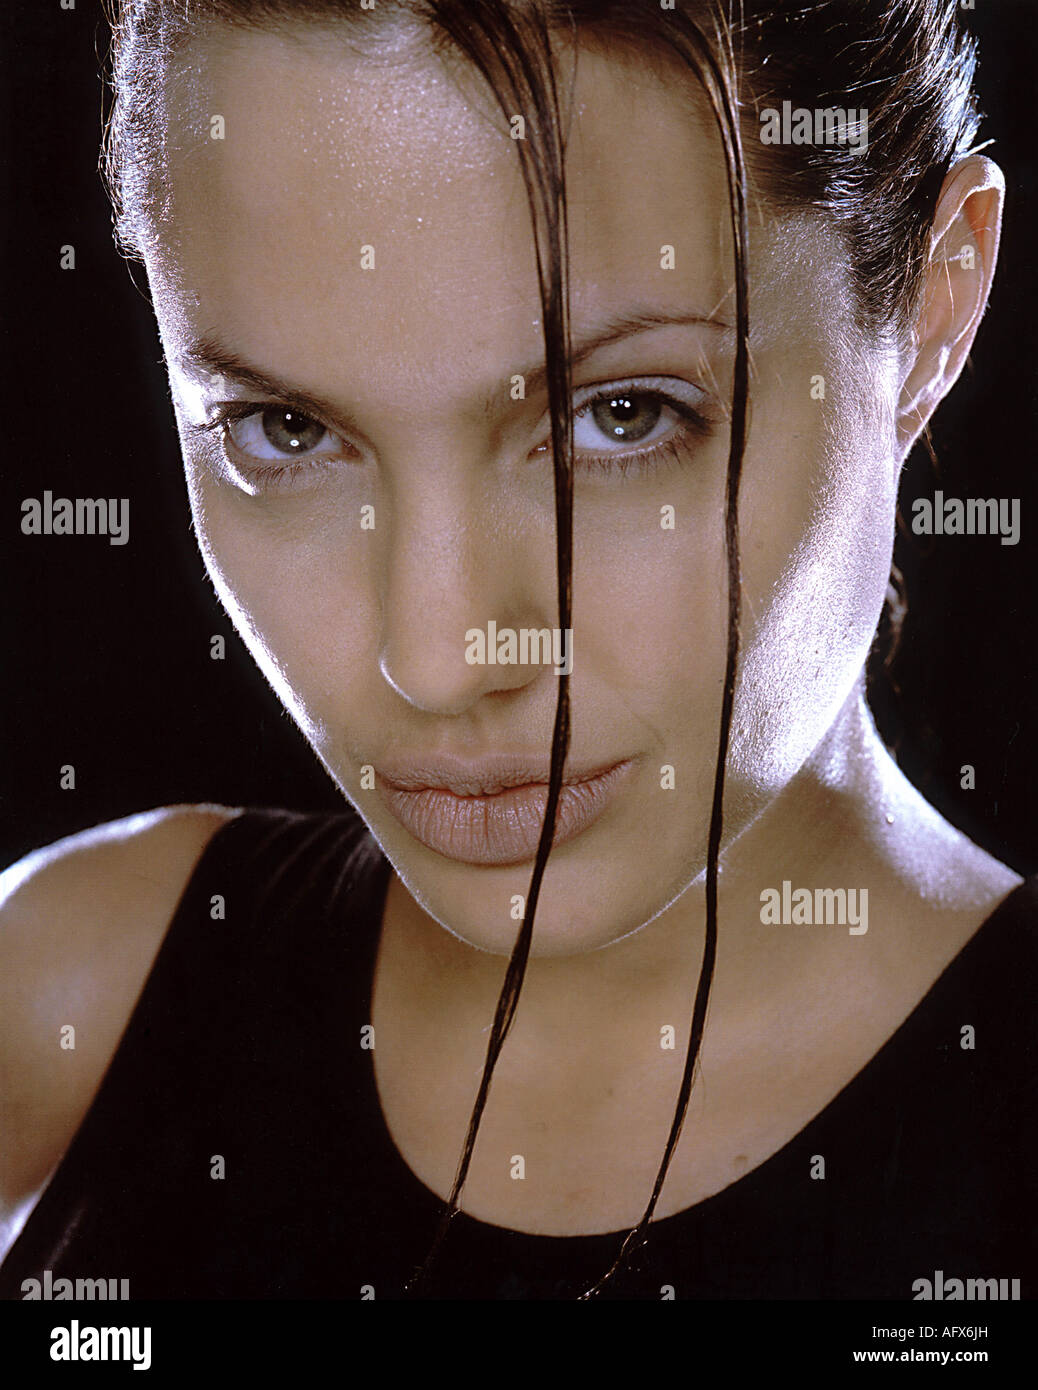 LARA CROFT TOMB RAIDER  2001 Paramount film with Angelina Jolie - Stock Image